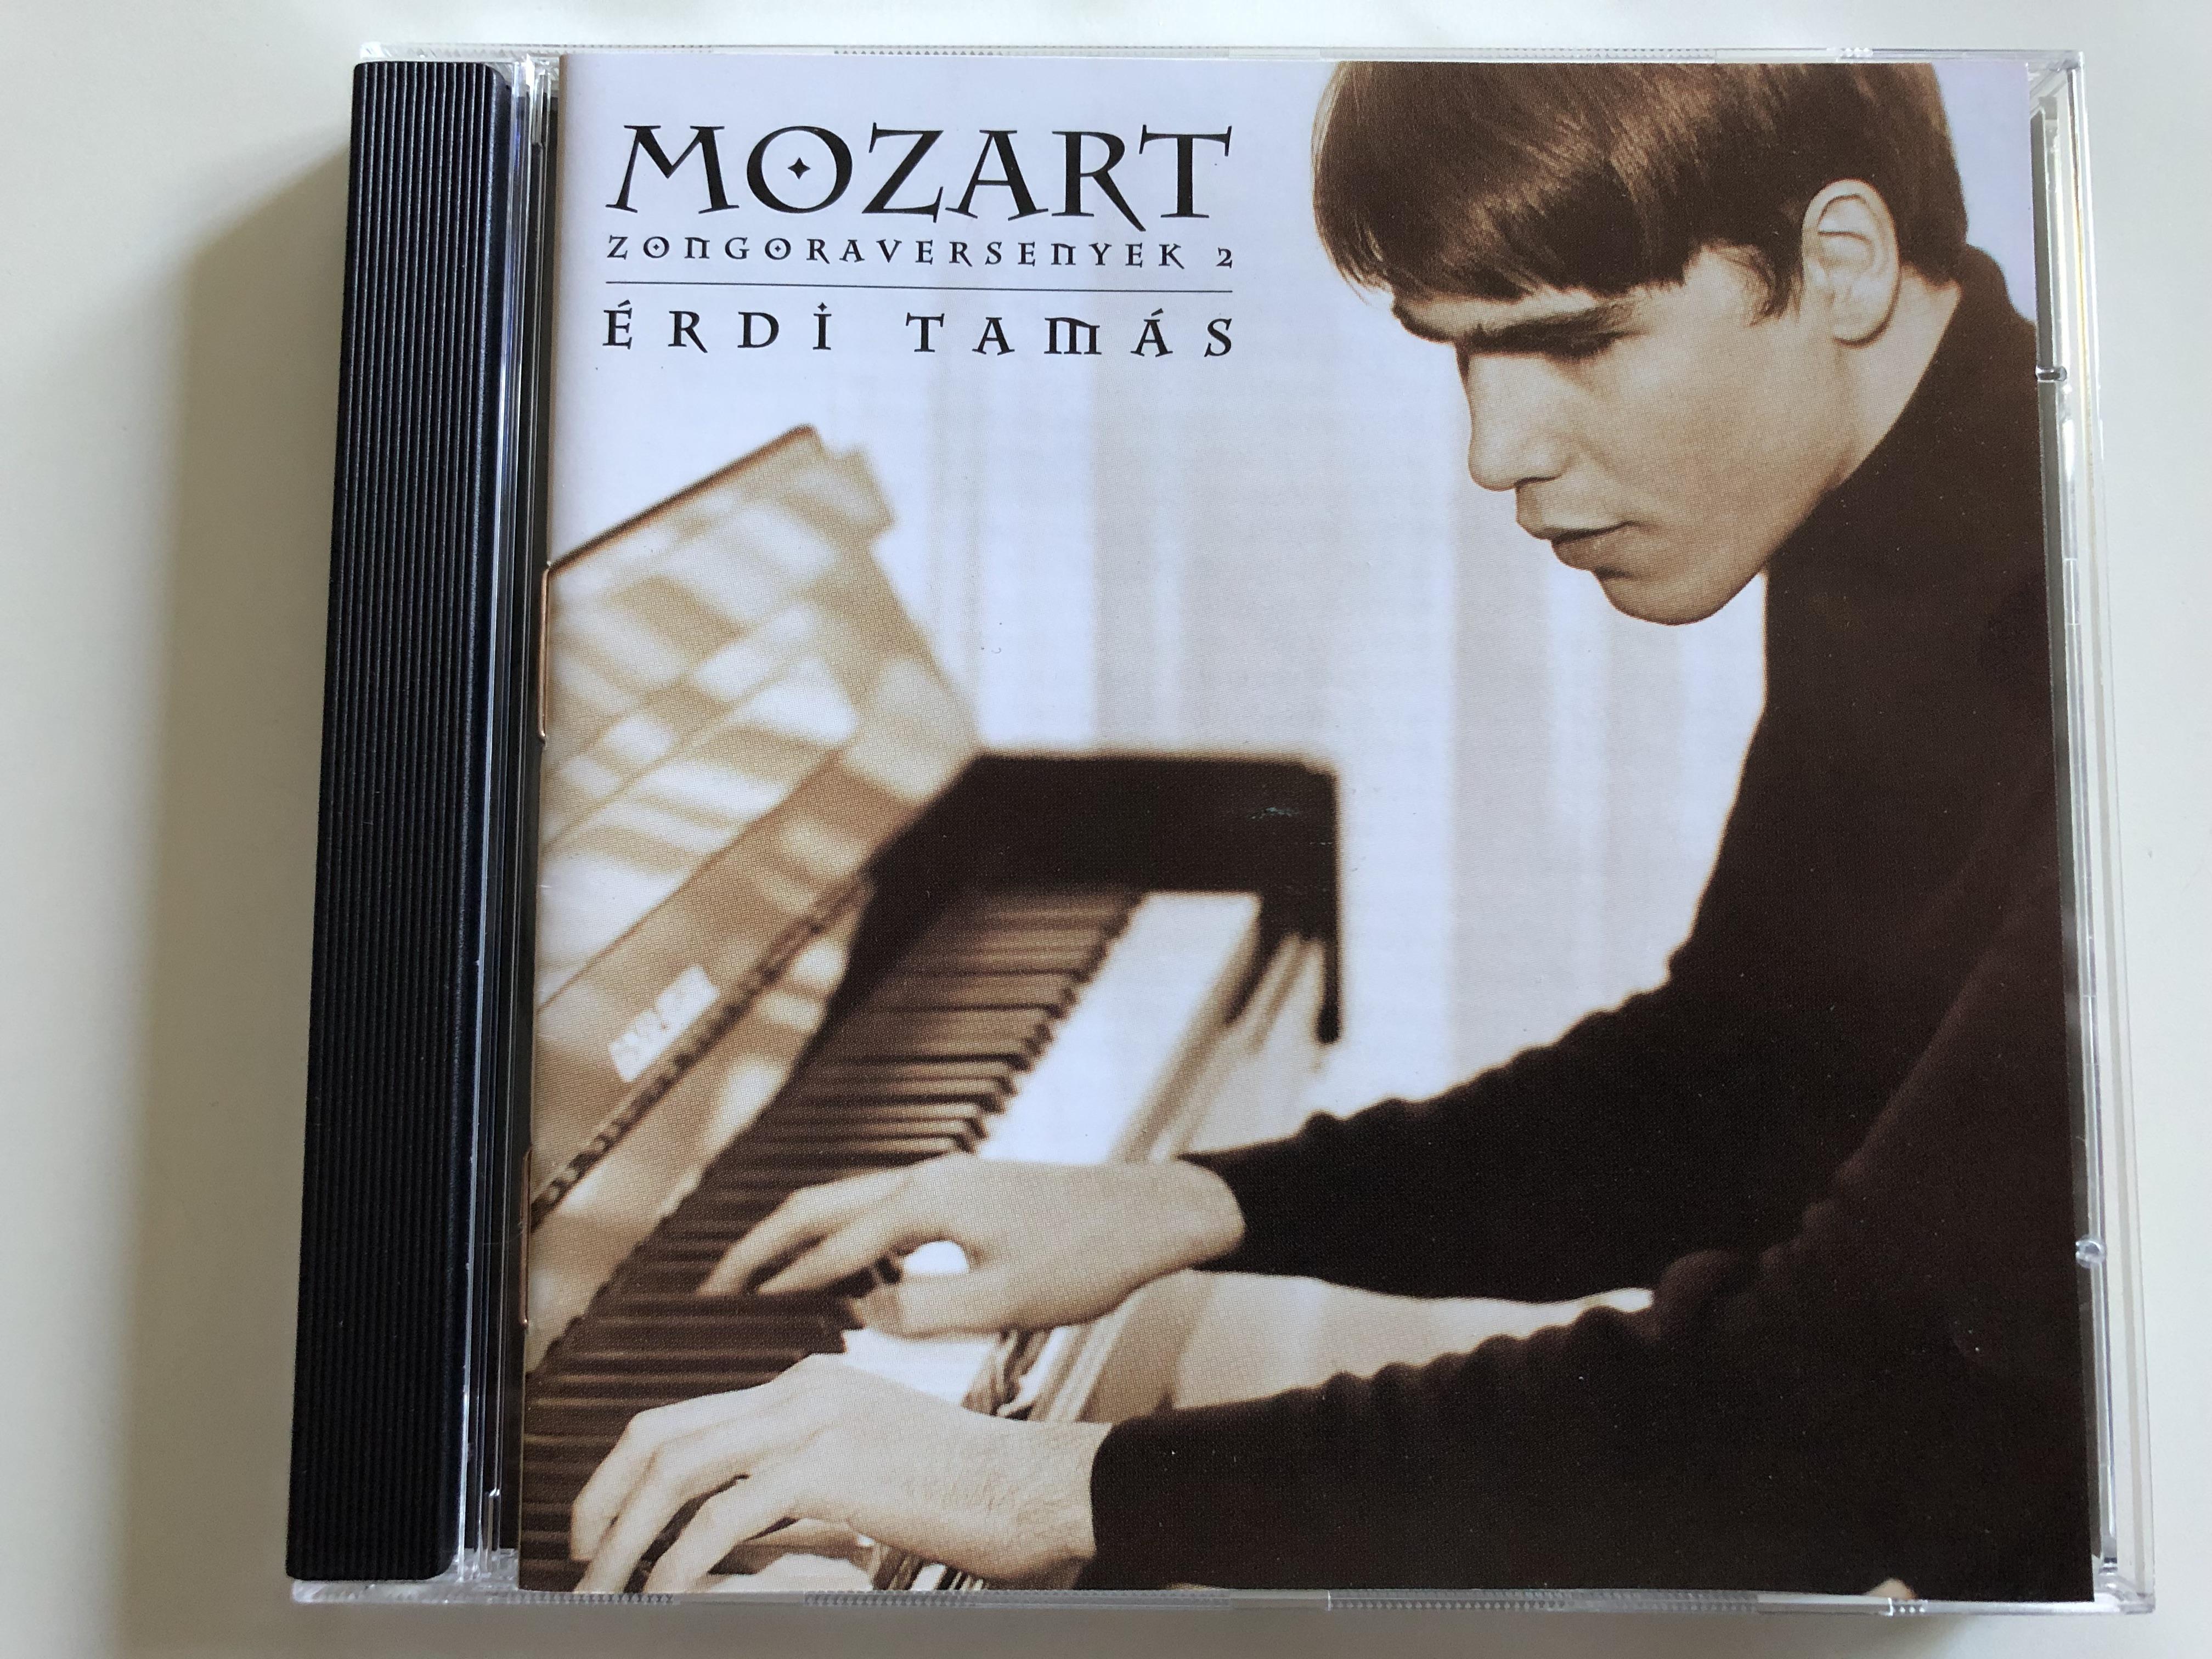 mozart-zongoraversenyek-2-erdi-tamas-mega-audio-cd-mcda-87902-1-.jpg